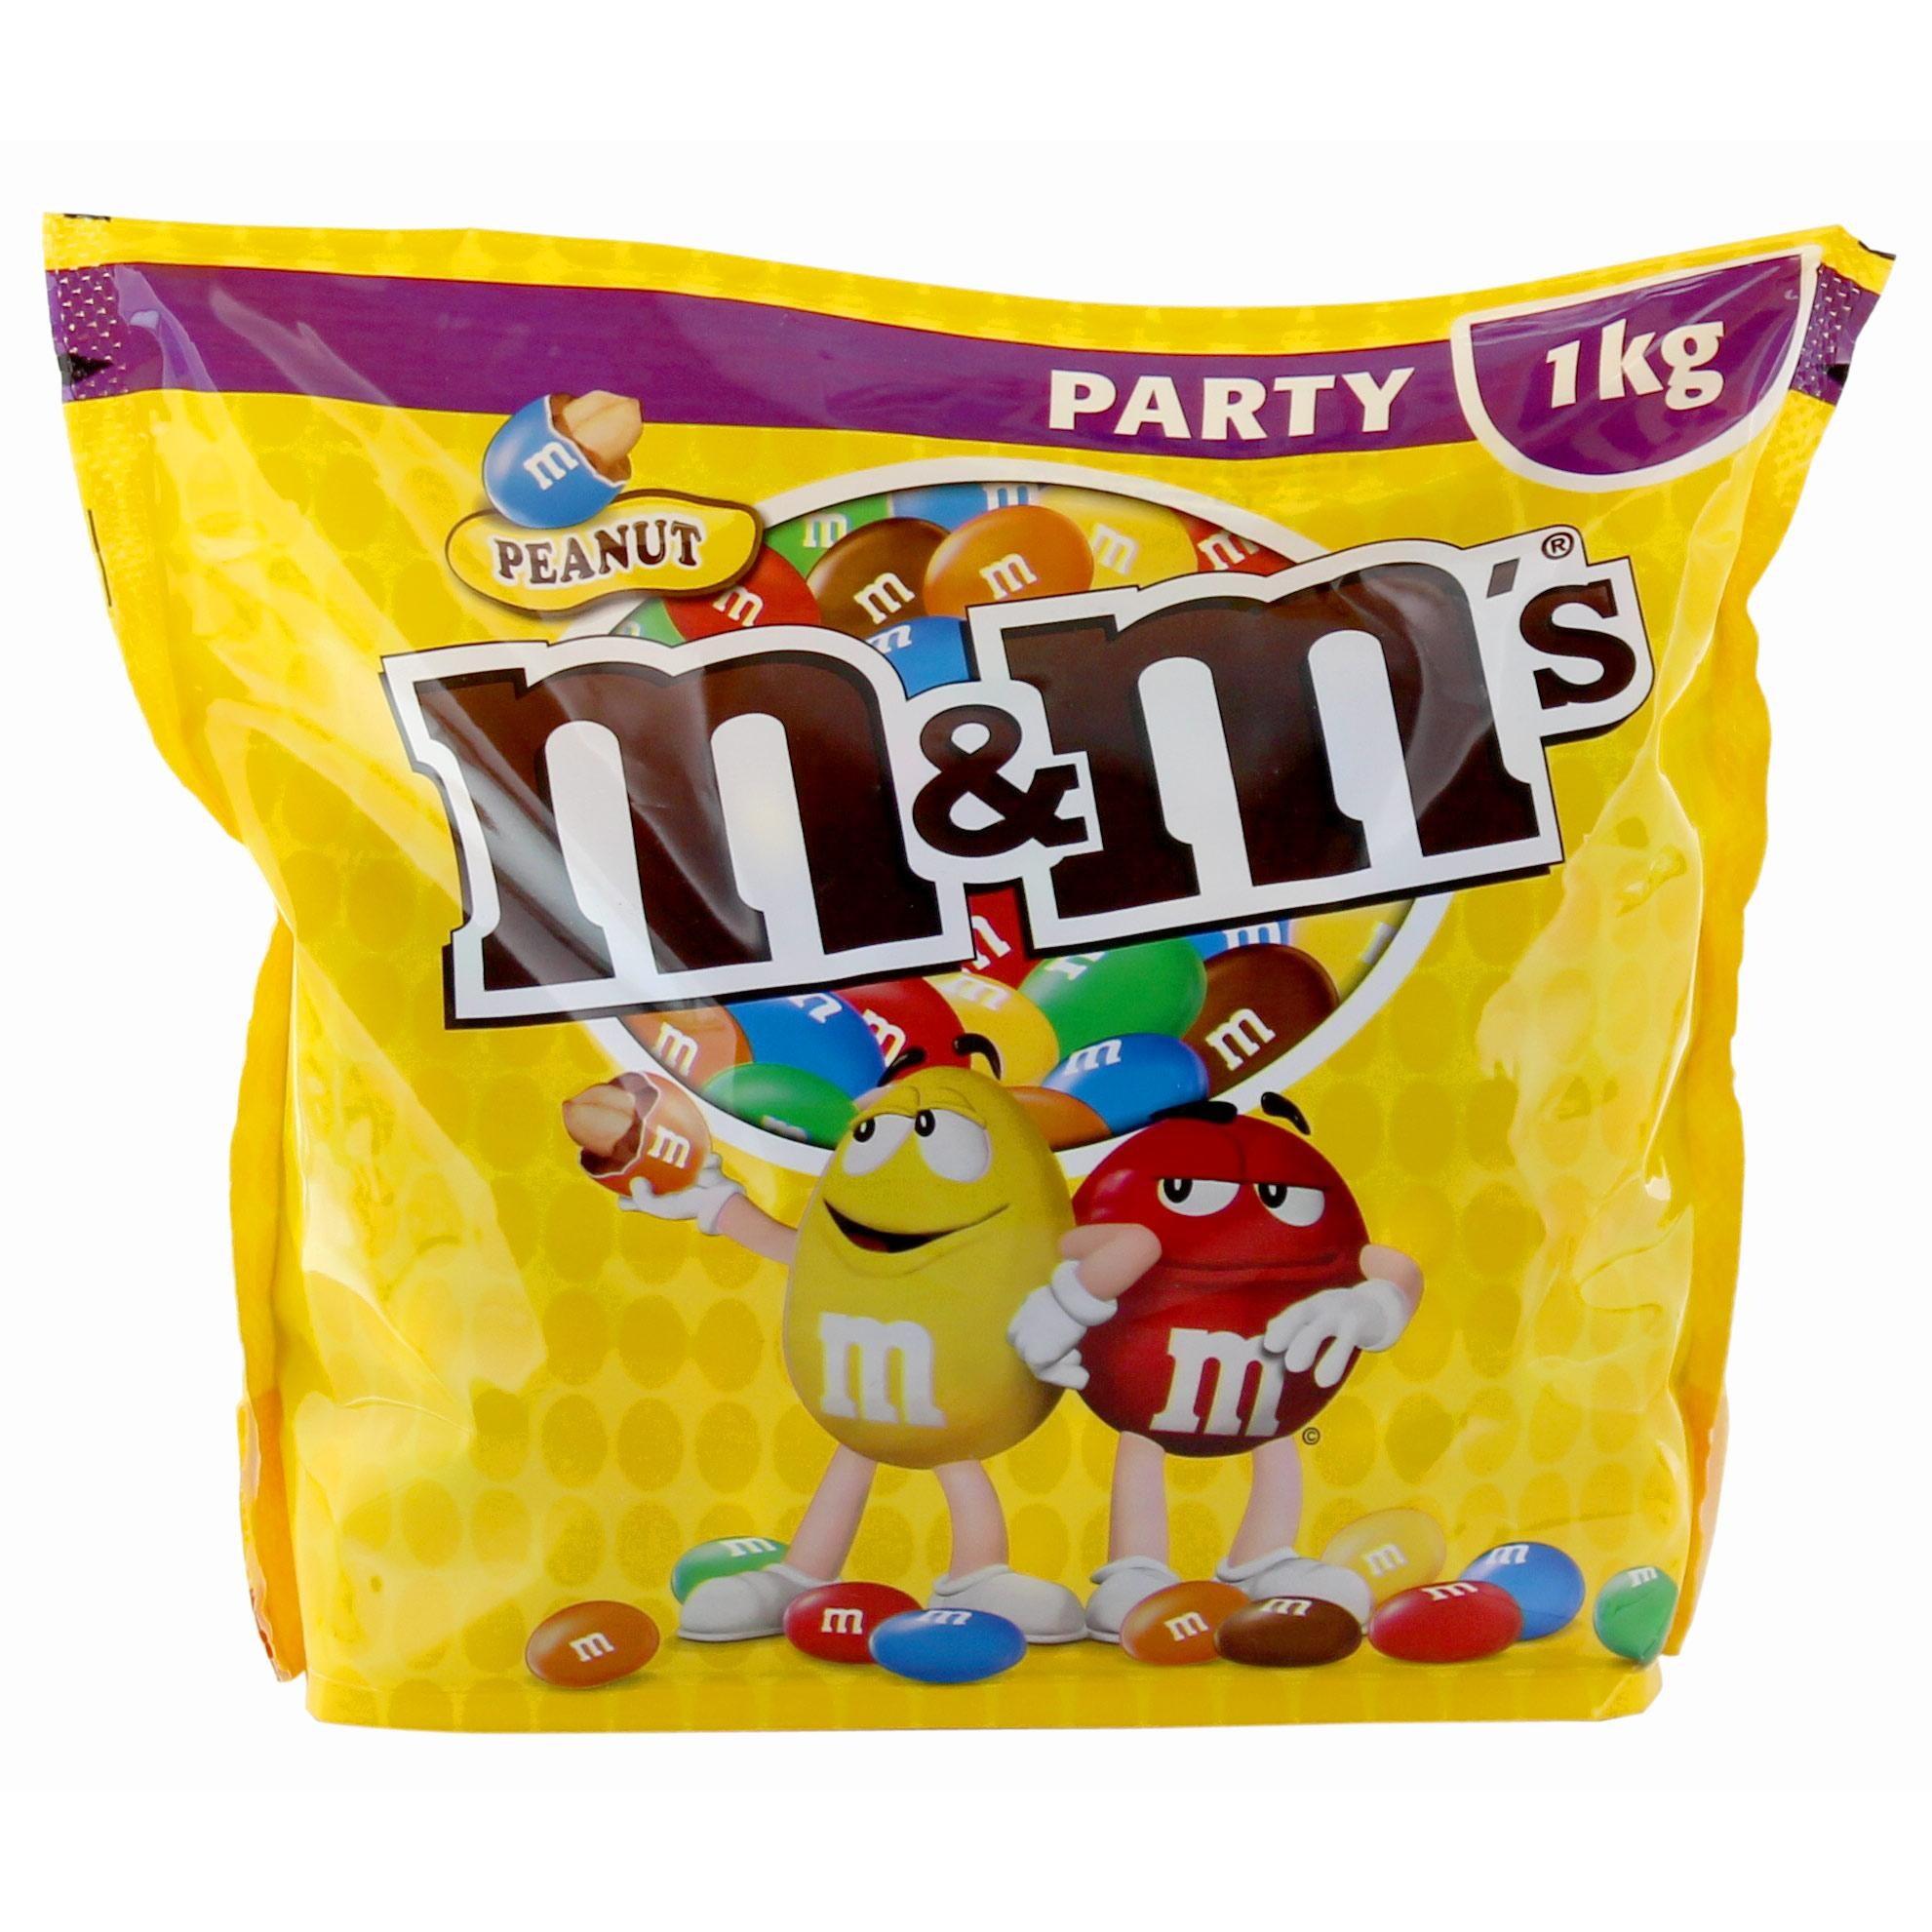 M&M'S - Peanut Party Pack Erdnüsse in Schokoladenhülle- 1kg